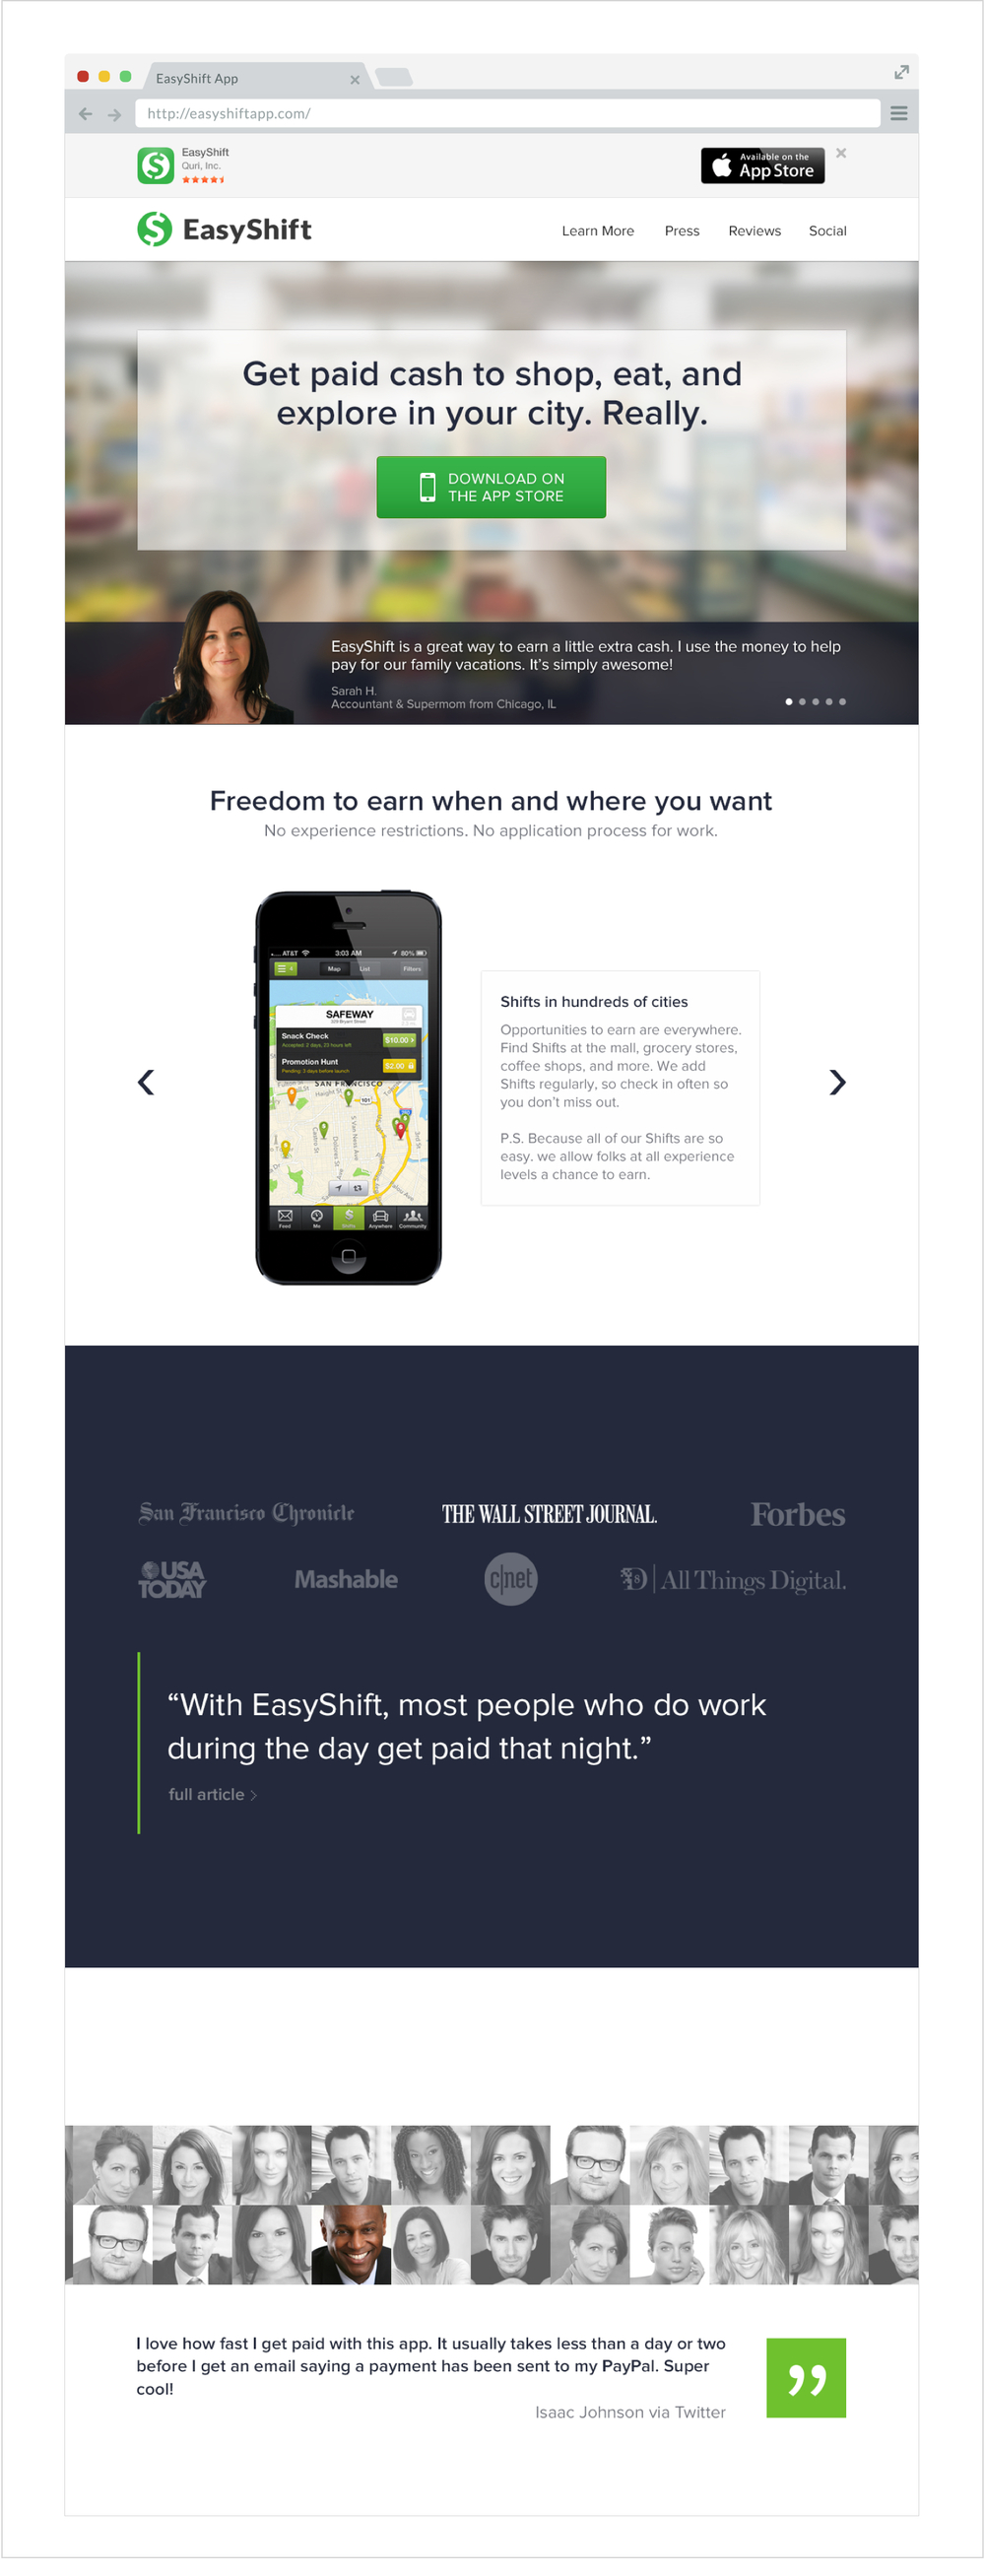 Fig 4.  EasyShiftapp.com, 2013